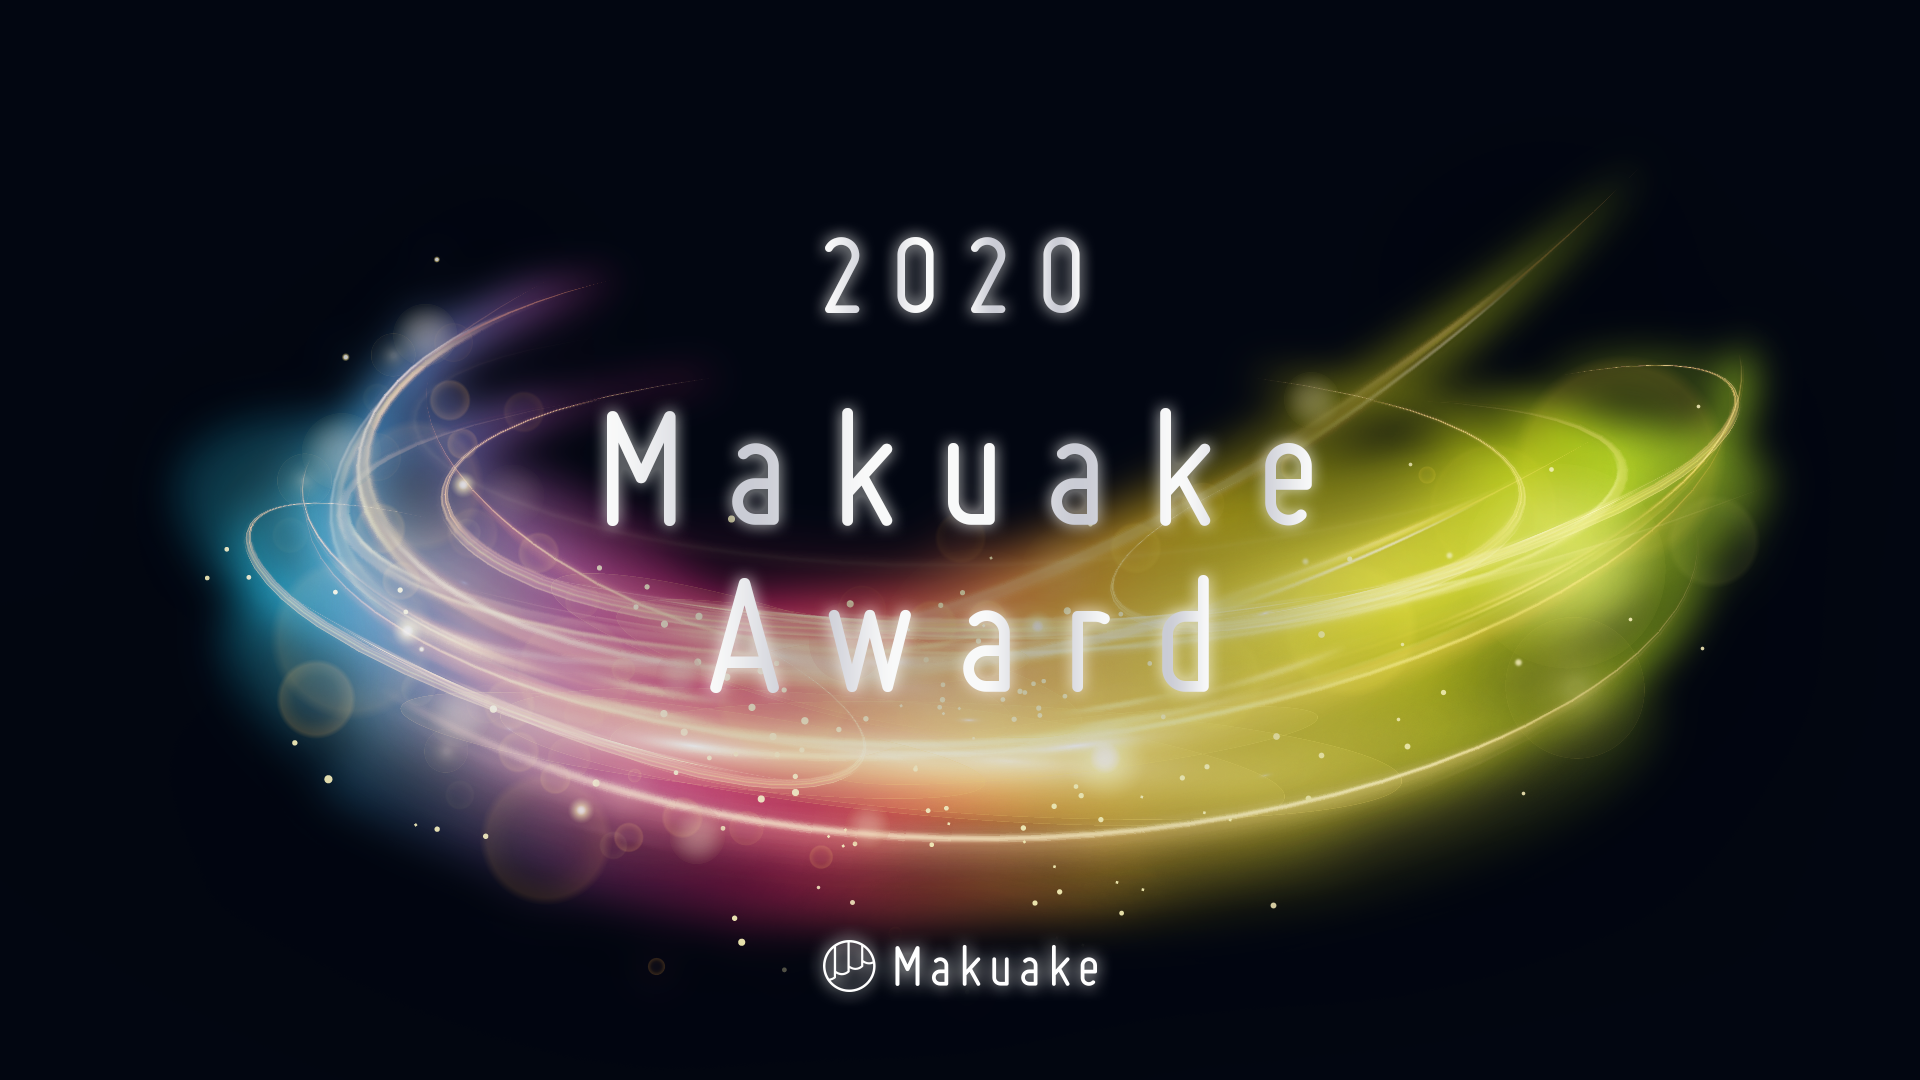 Makuake主催の表彰イベント「Makuake Award 2020」をオンライン上で開催